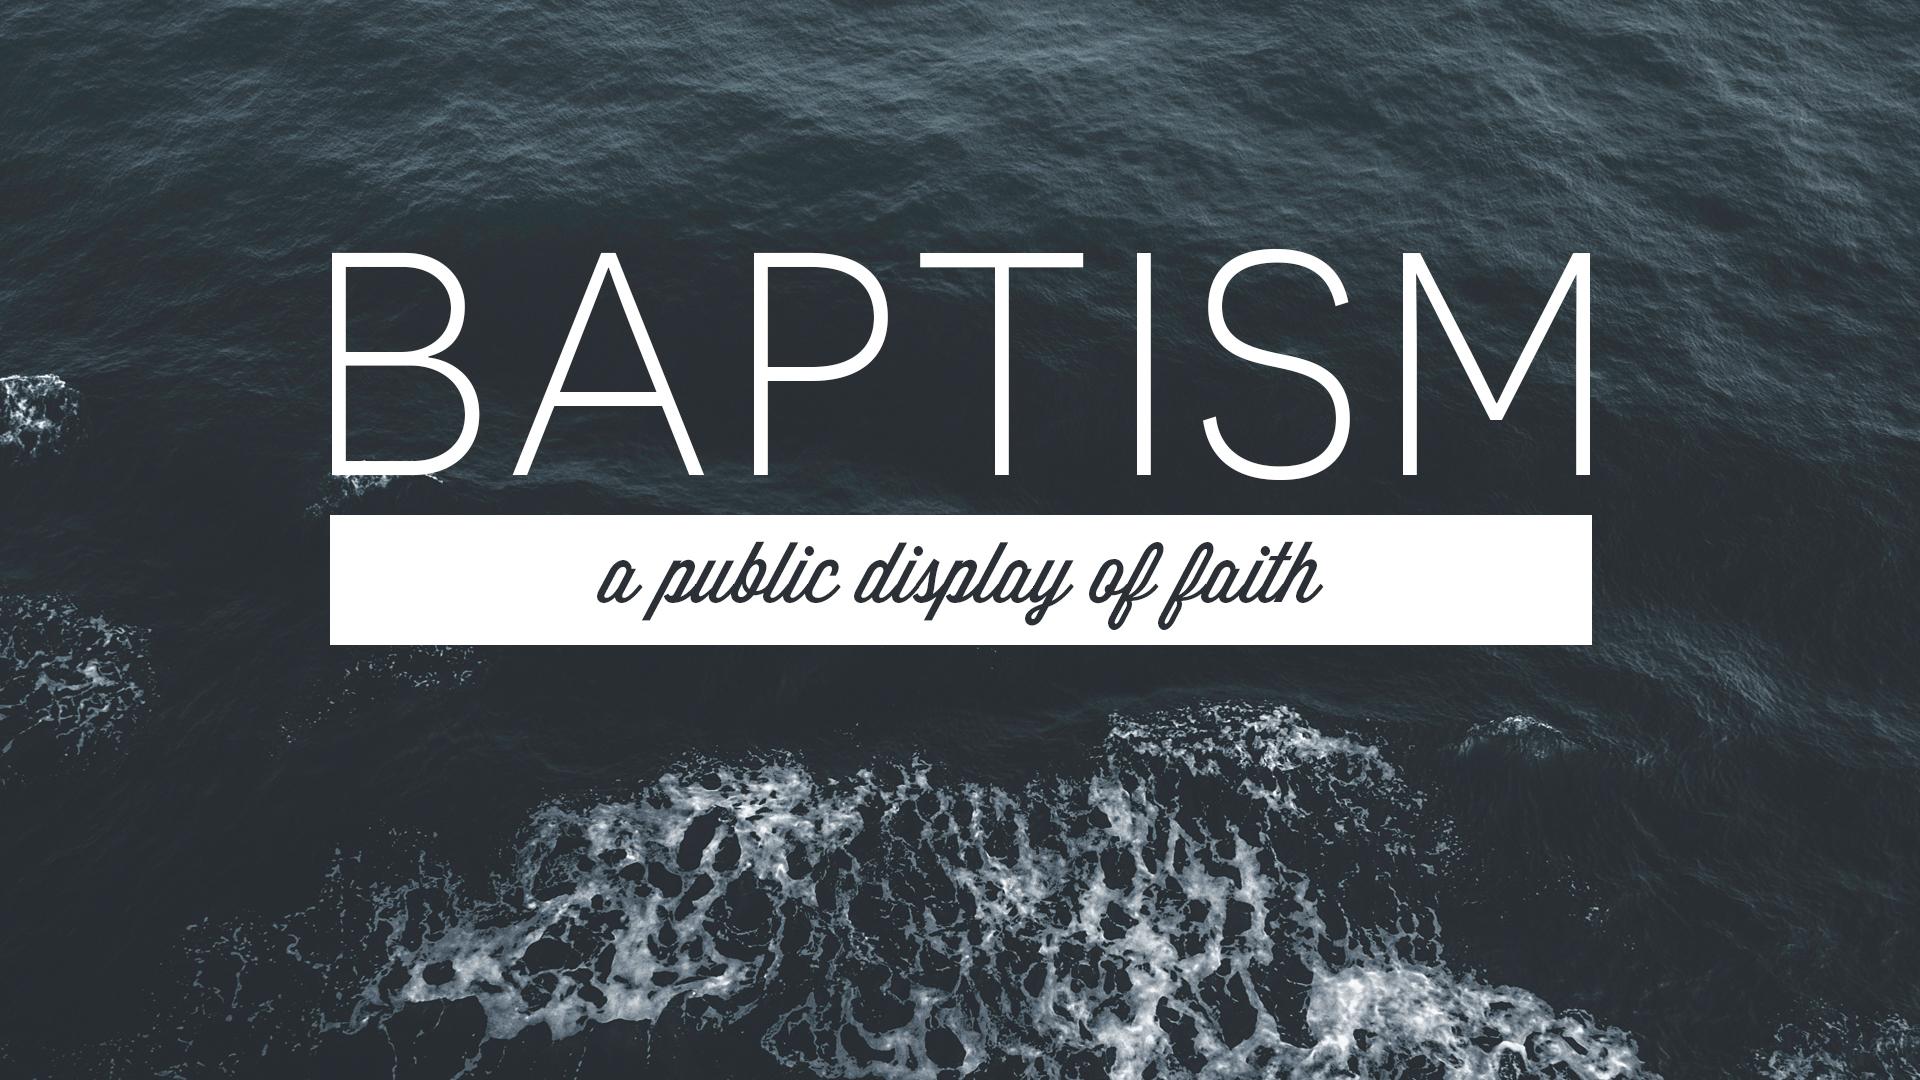 baptism general.jpg